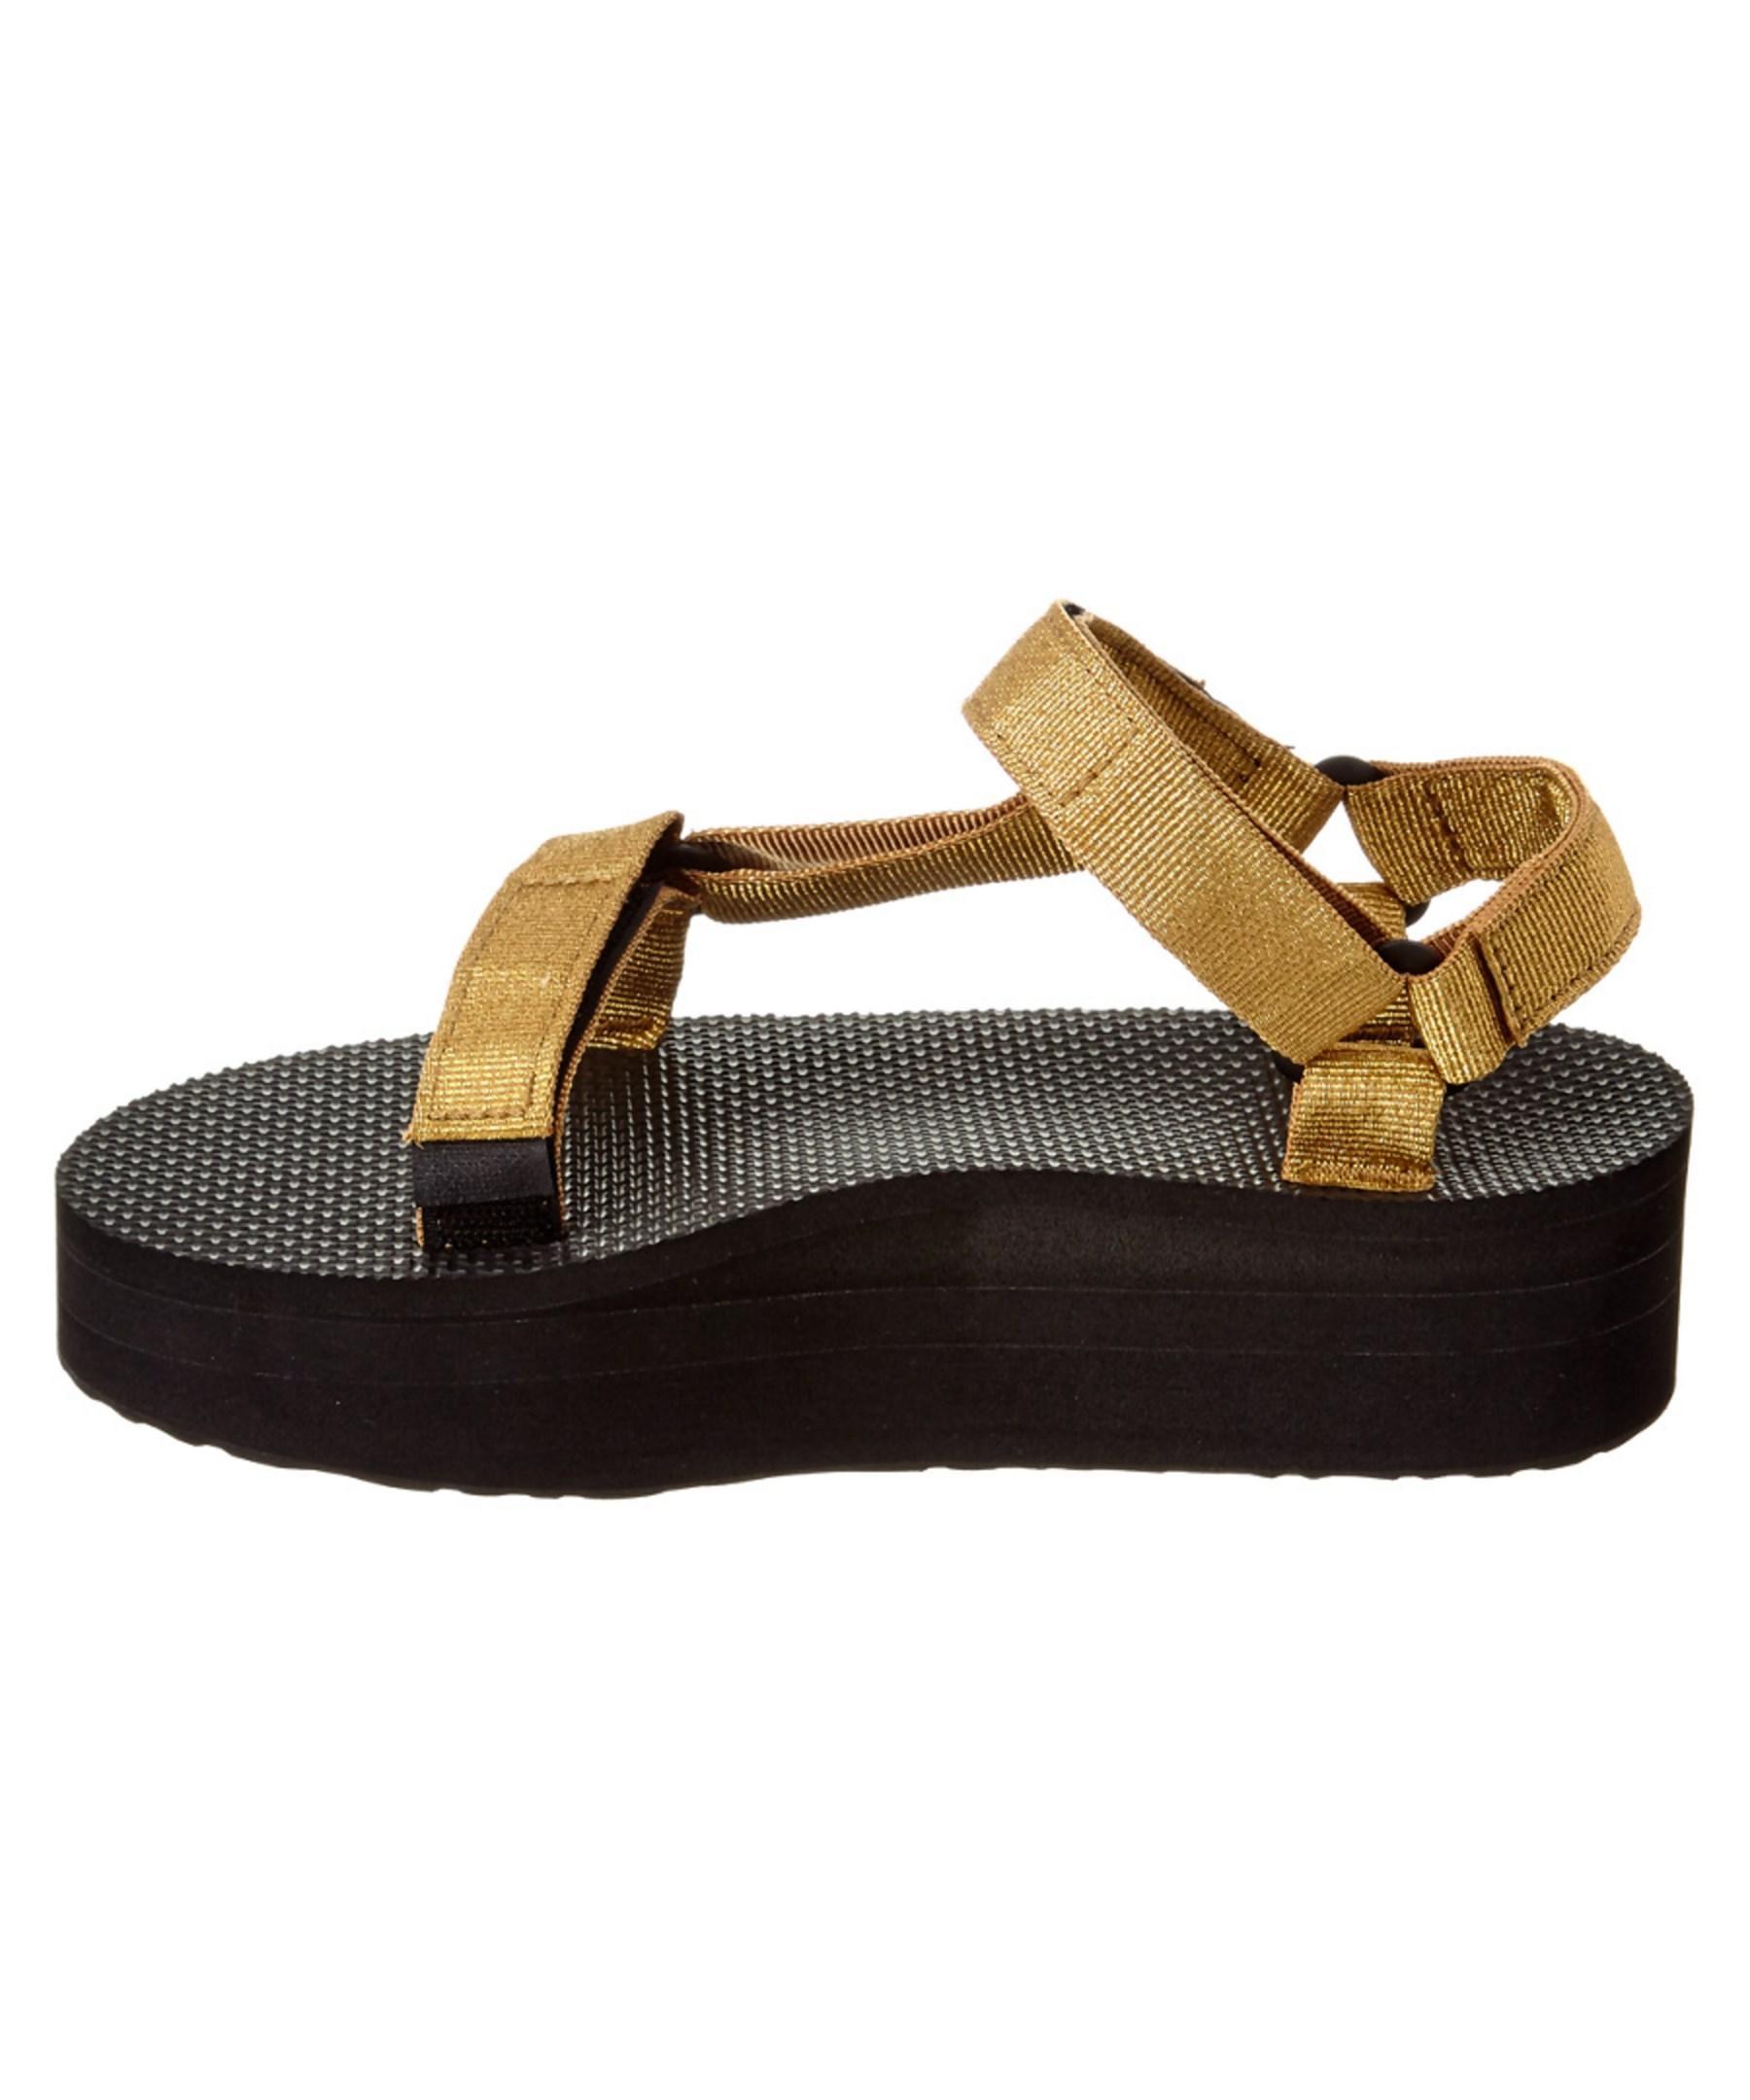 Teva Women's Flatform Universal Sandal in Metallic